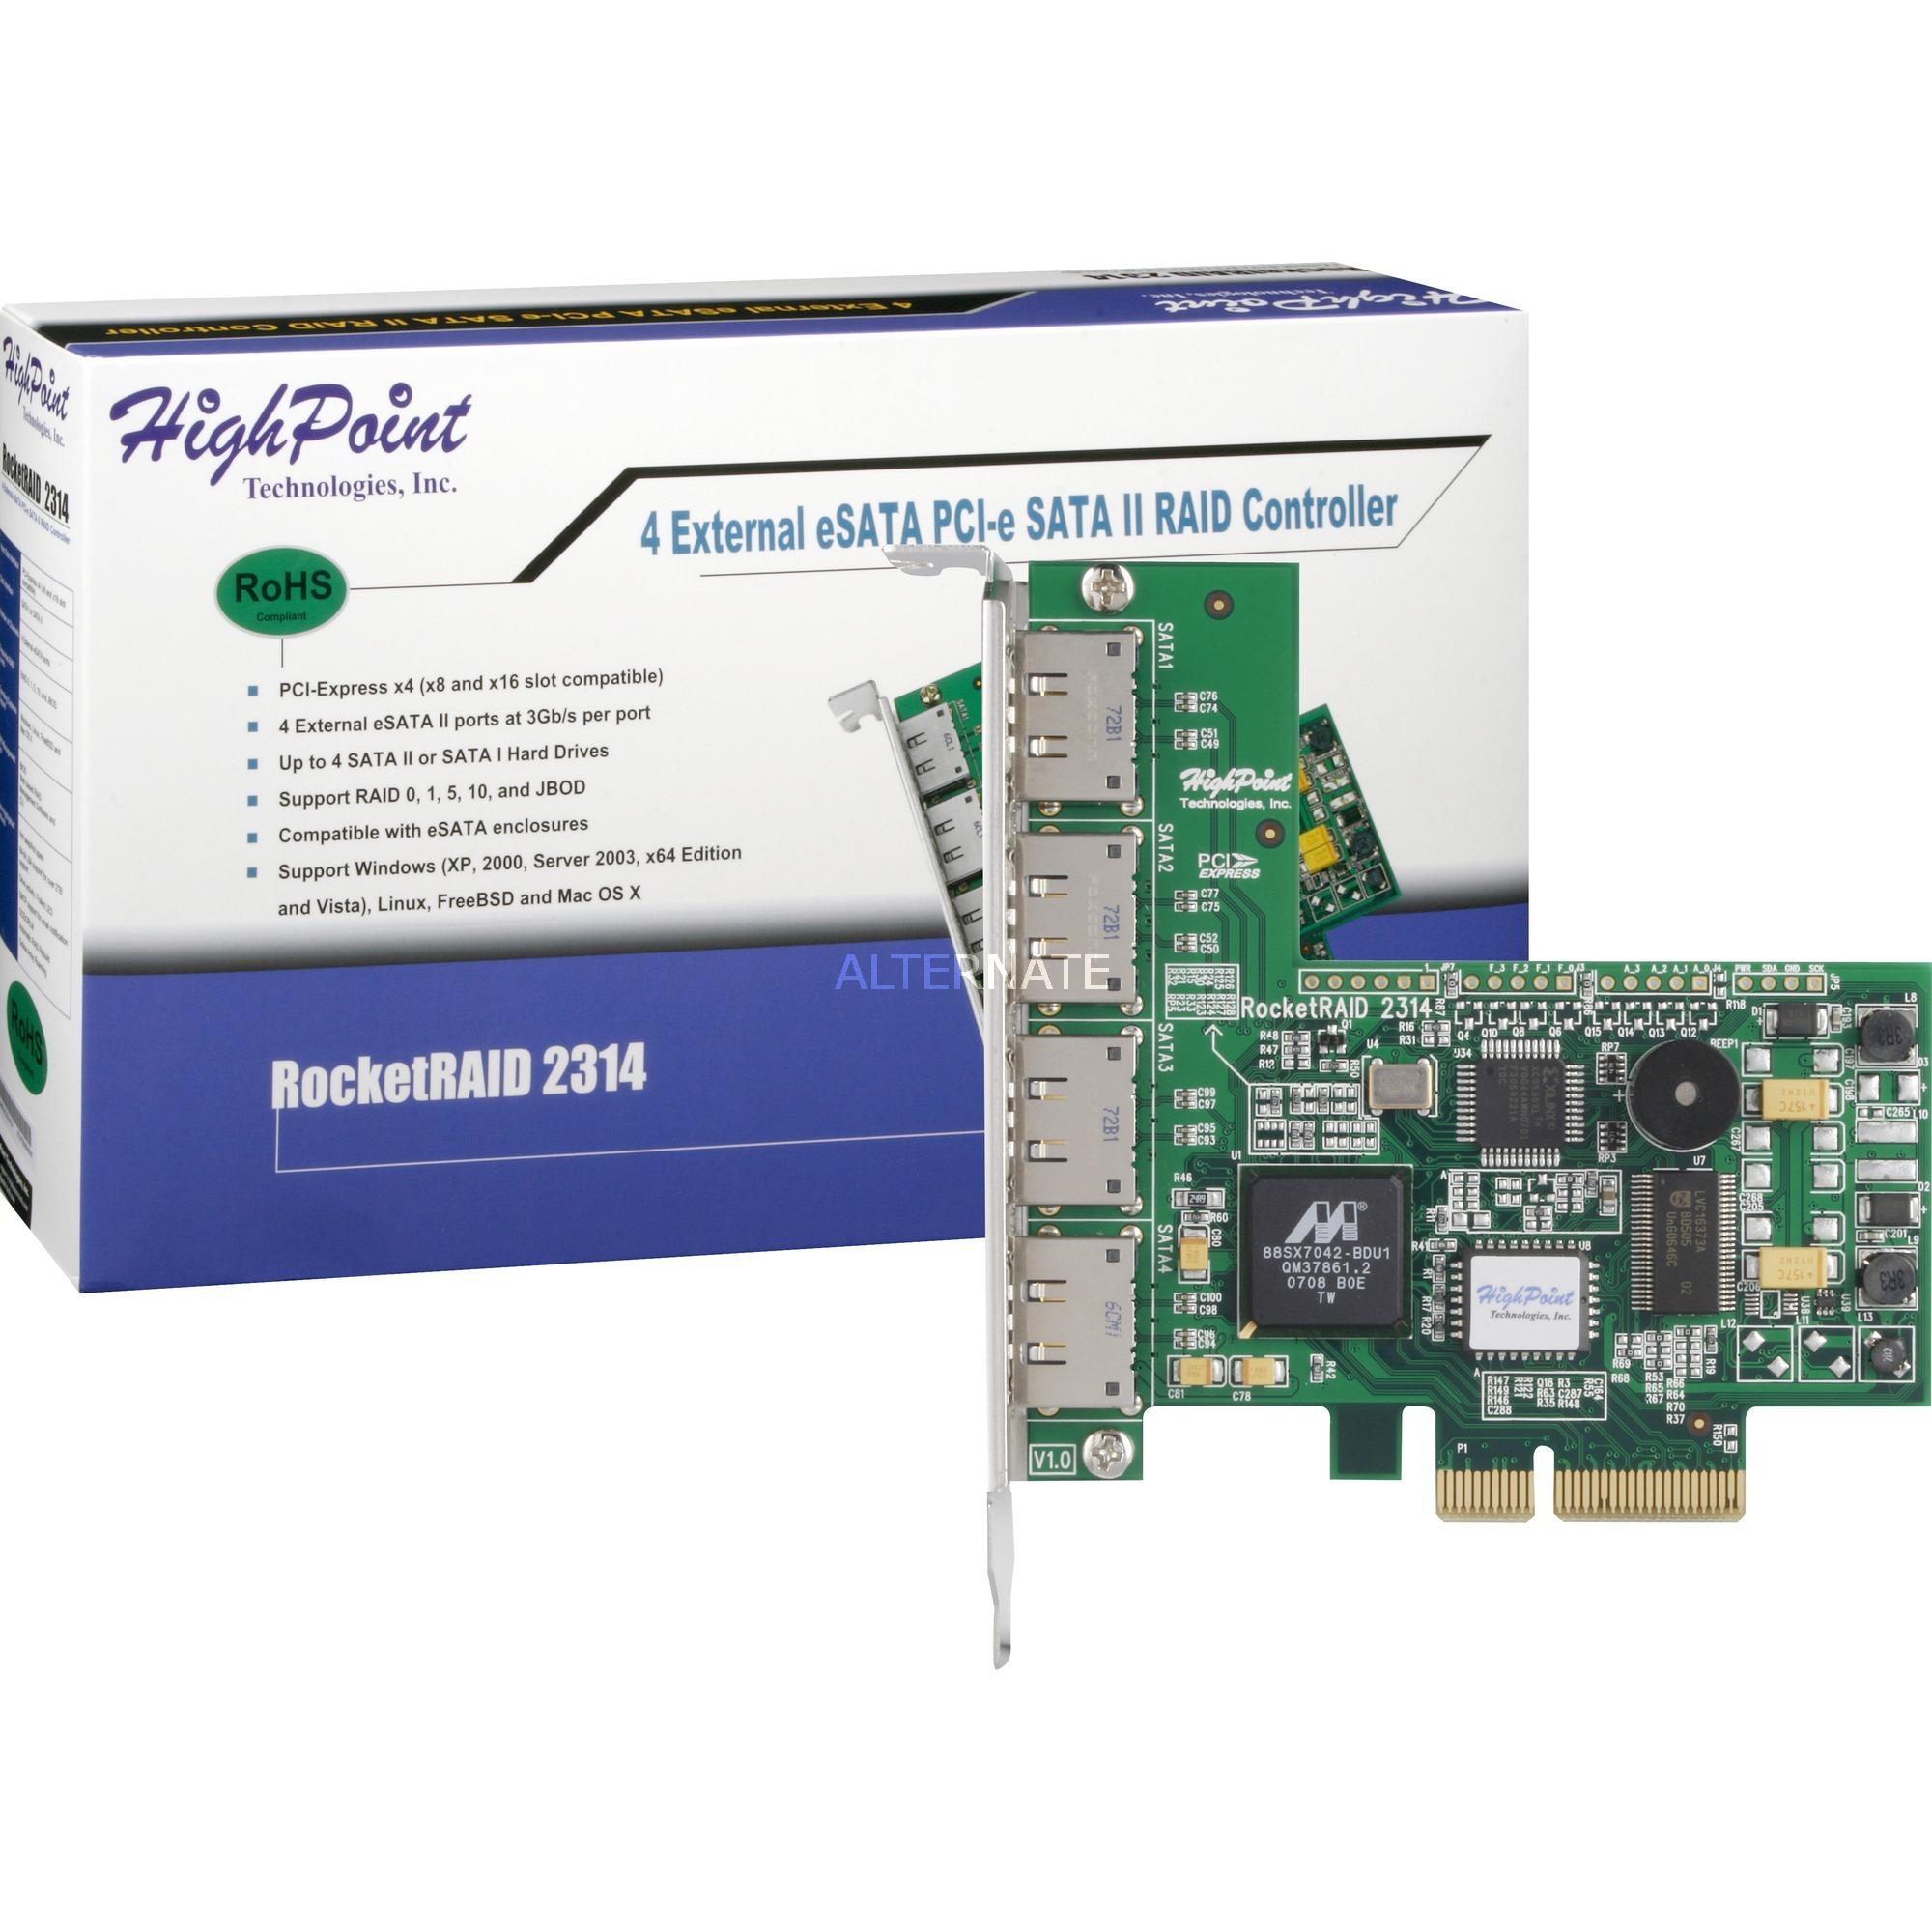 RocketRAID 2314 3Gbit/s controlado RAID, Controlador